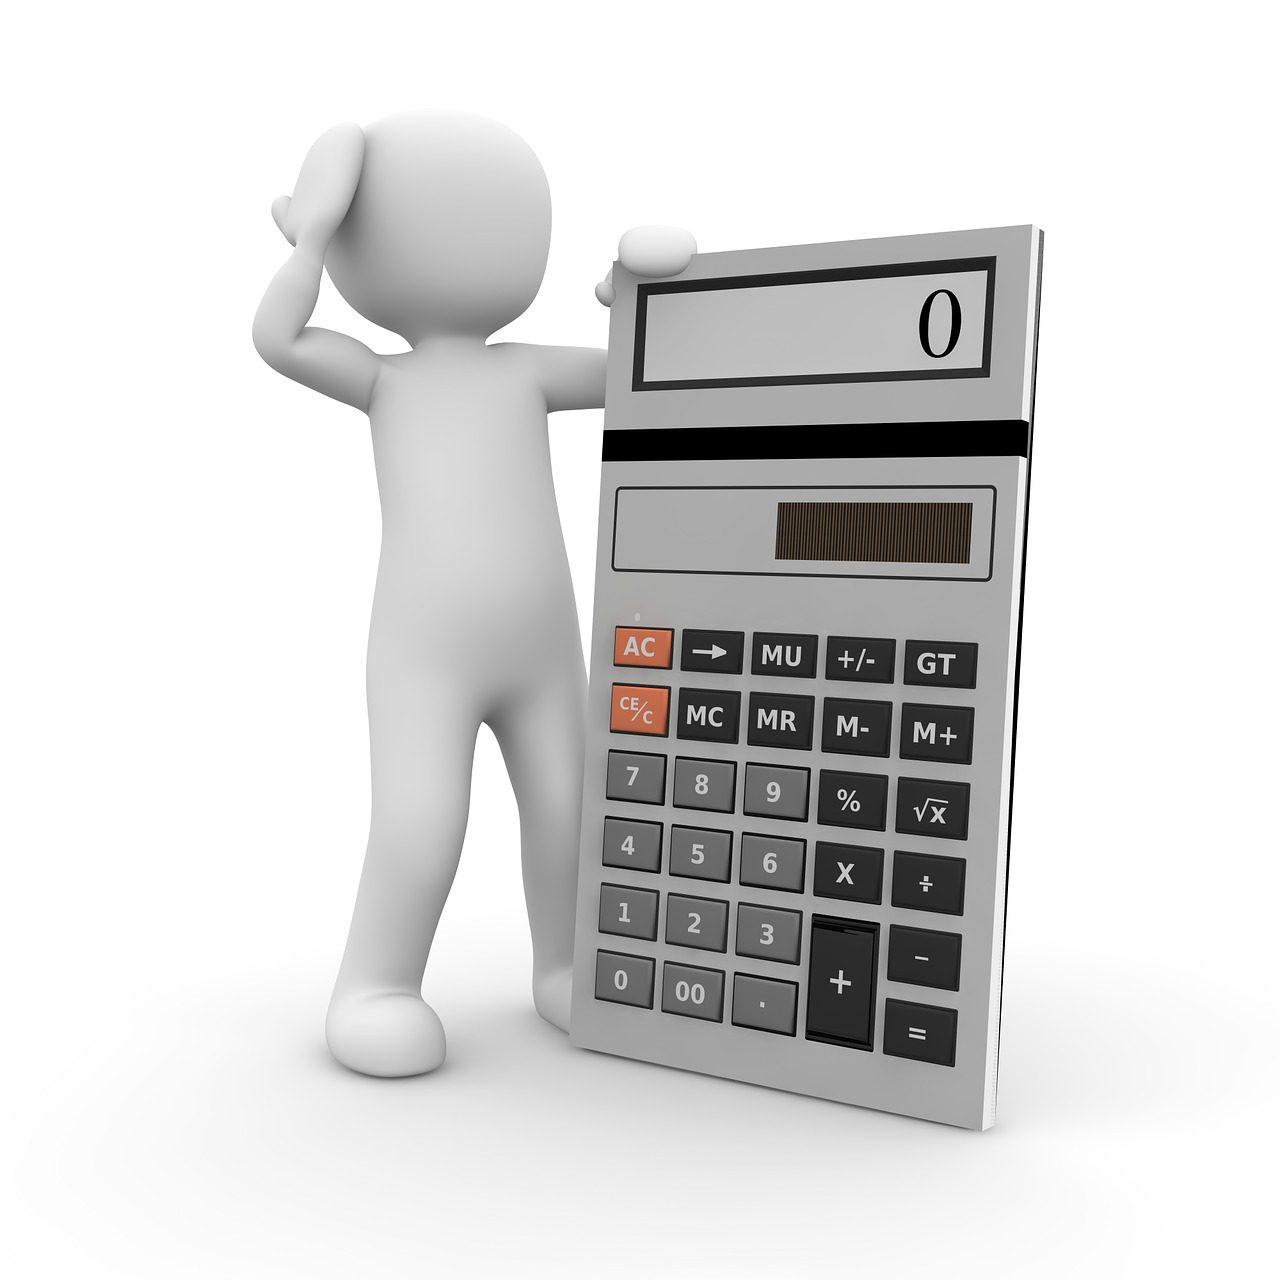 A cartoon person leaning against a calculator